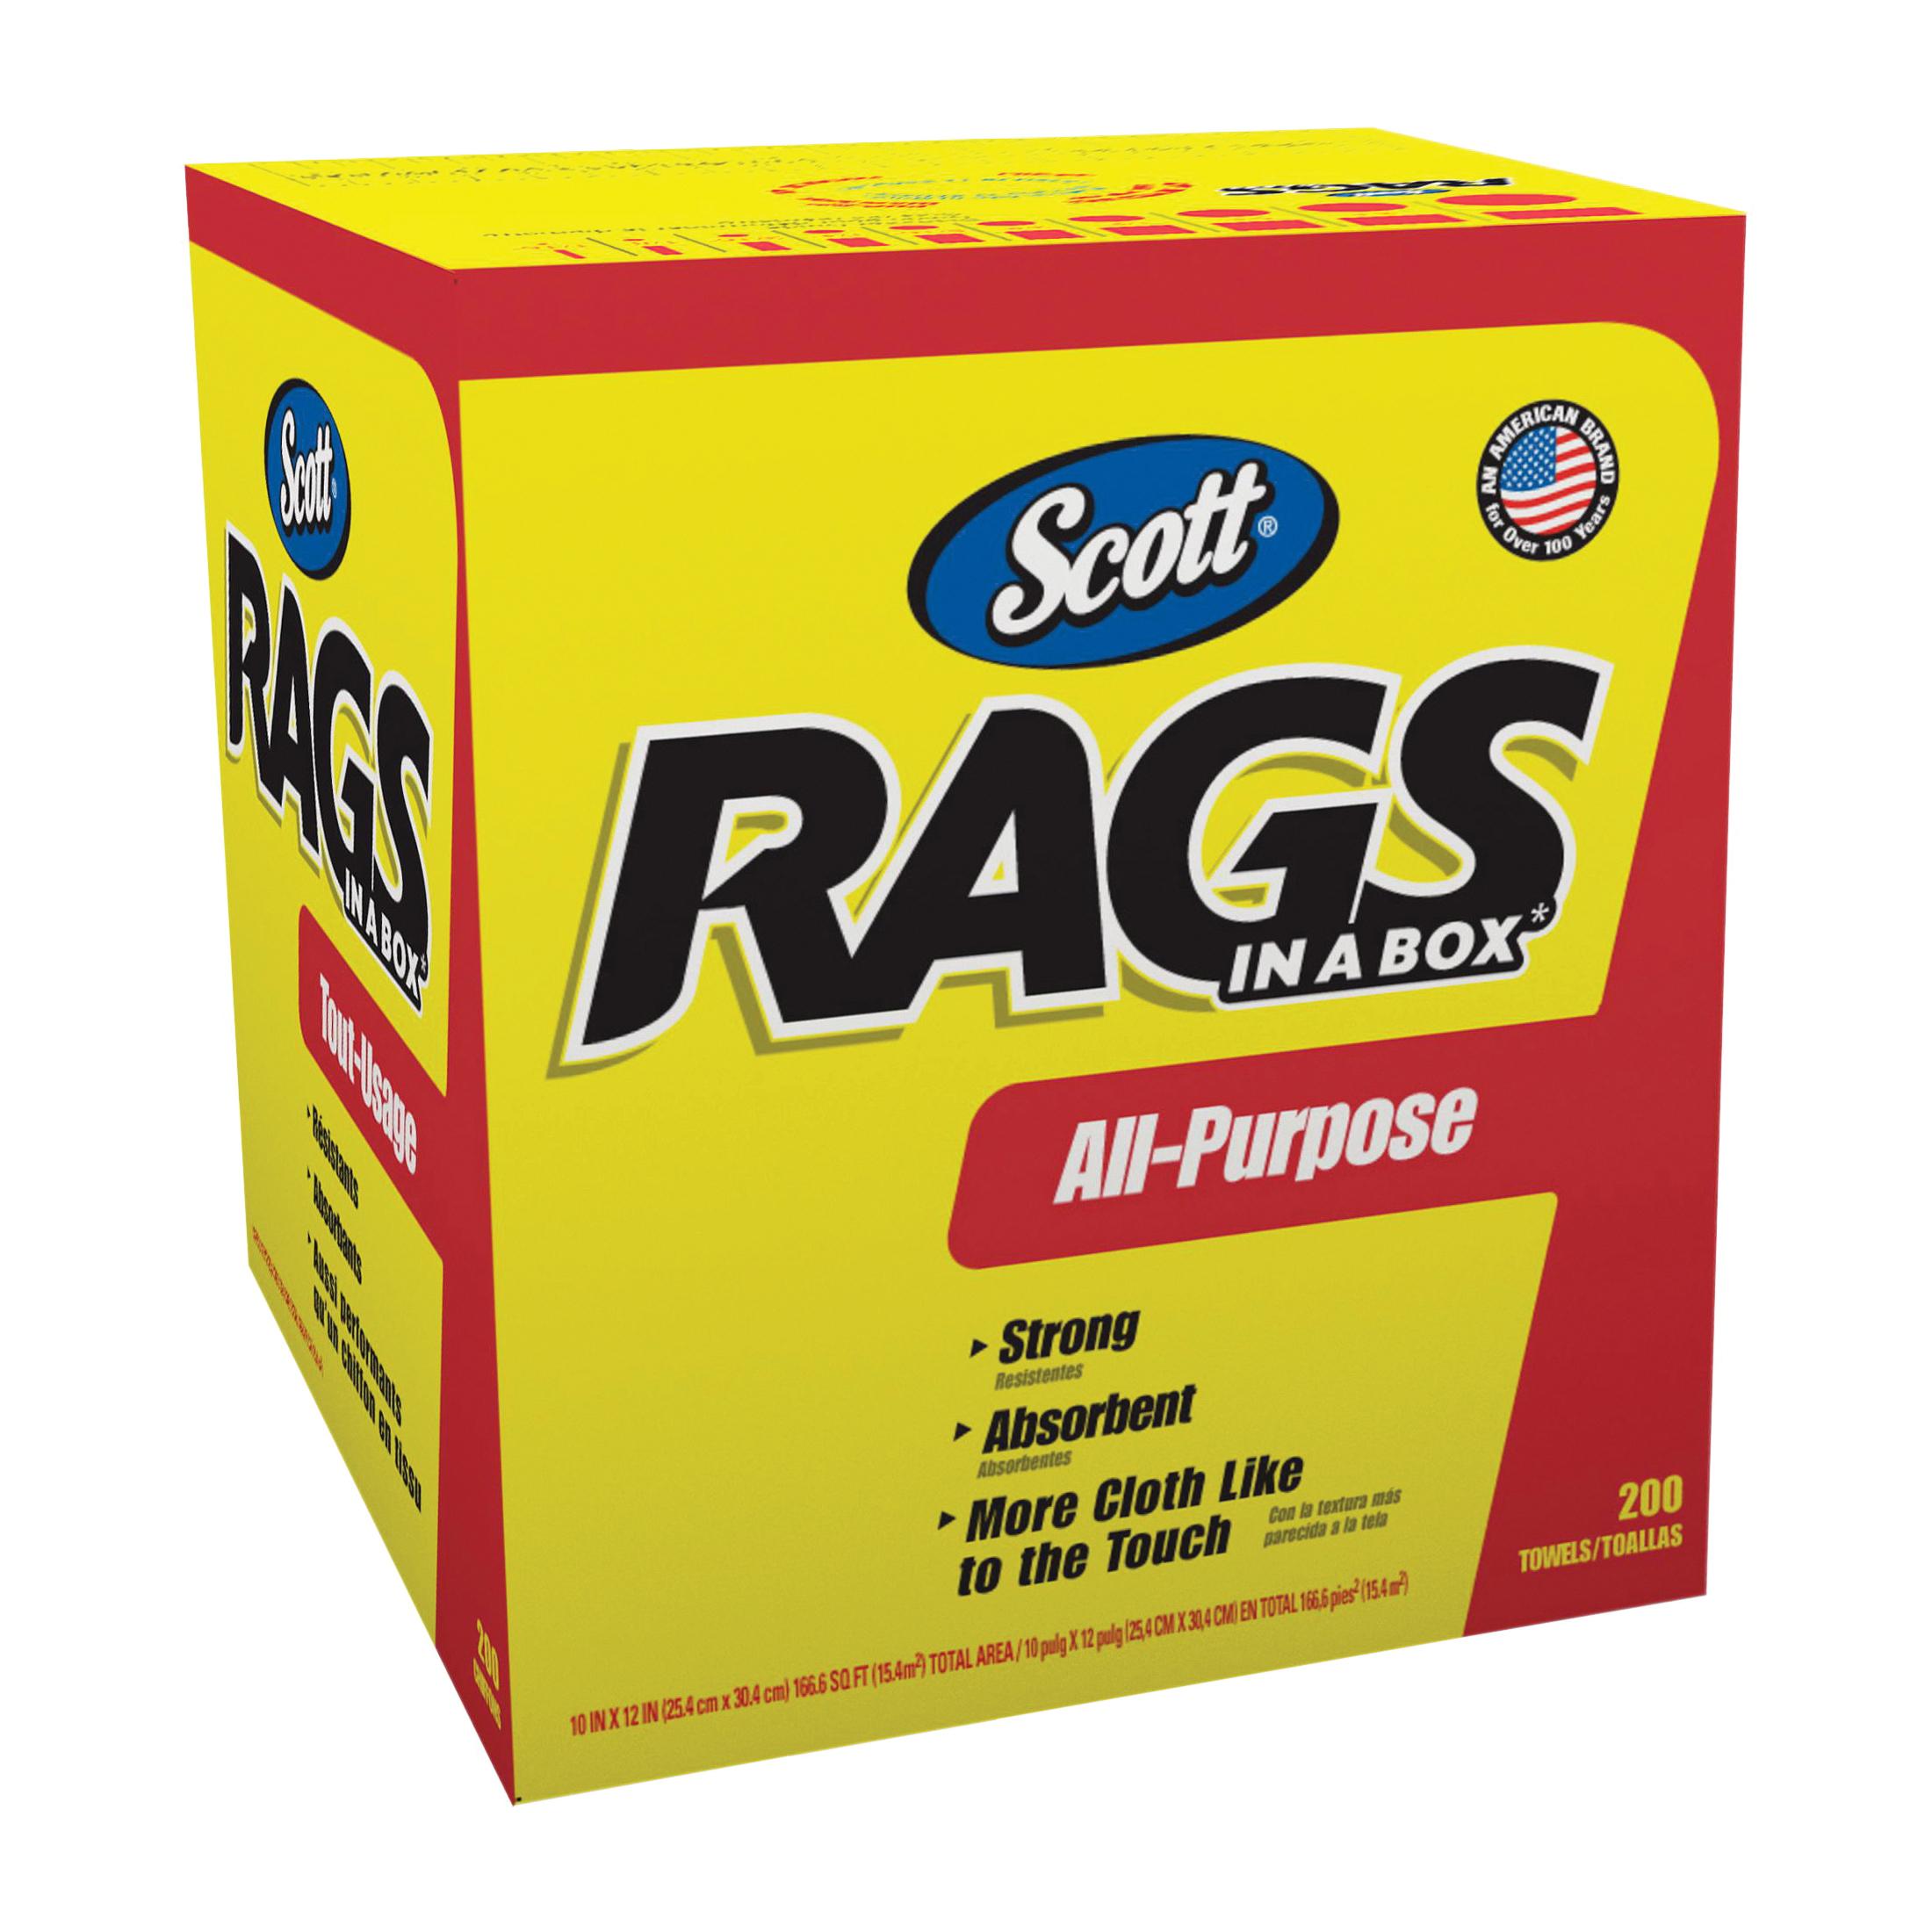 Picture of Scotts 75260 Painter's Rag, 10 x 12 in, Cellulose Fiber, White, Box